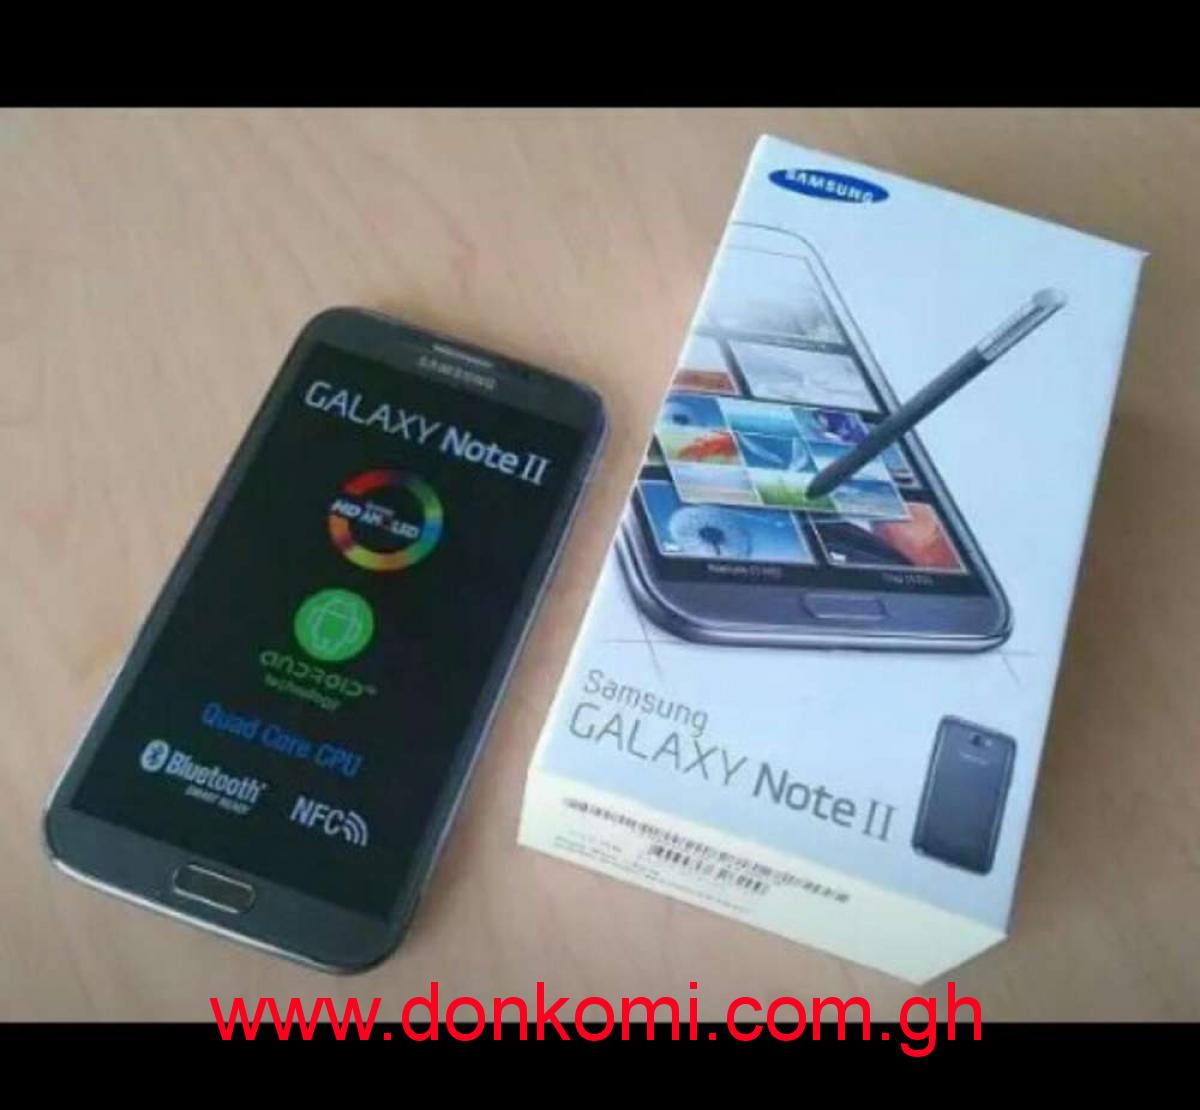 Note2 Samsung new